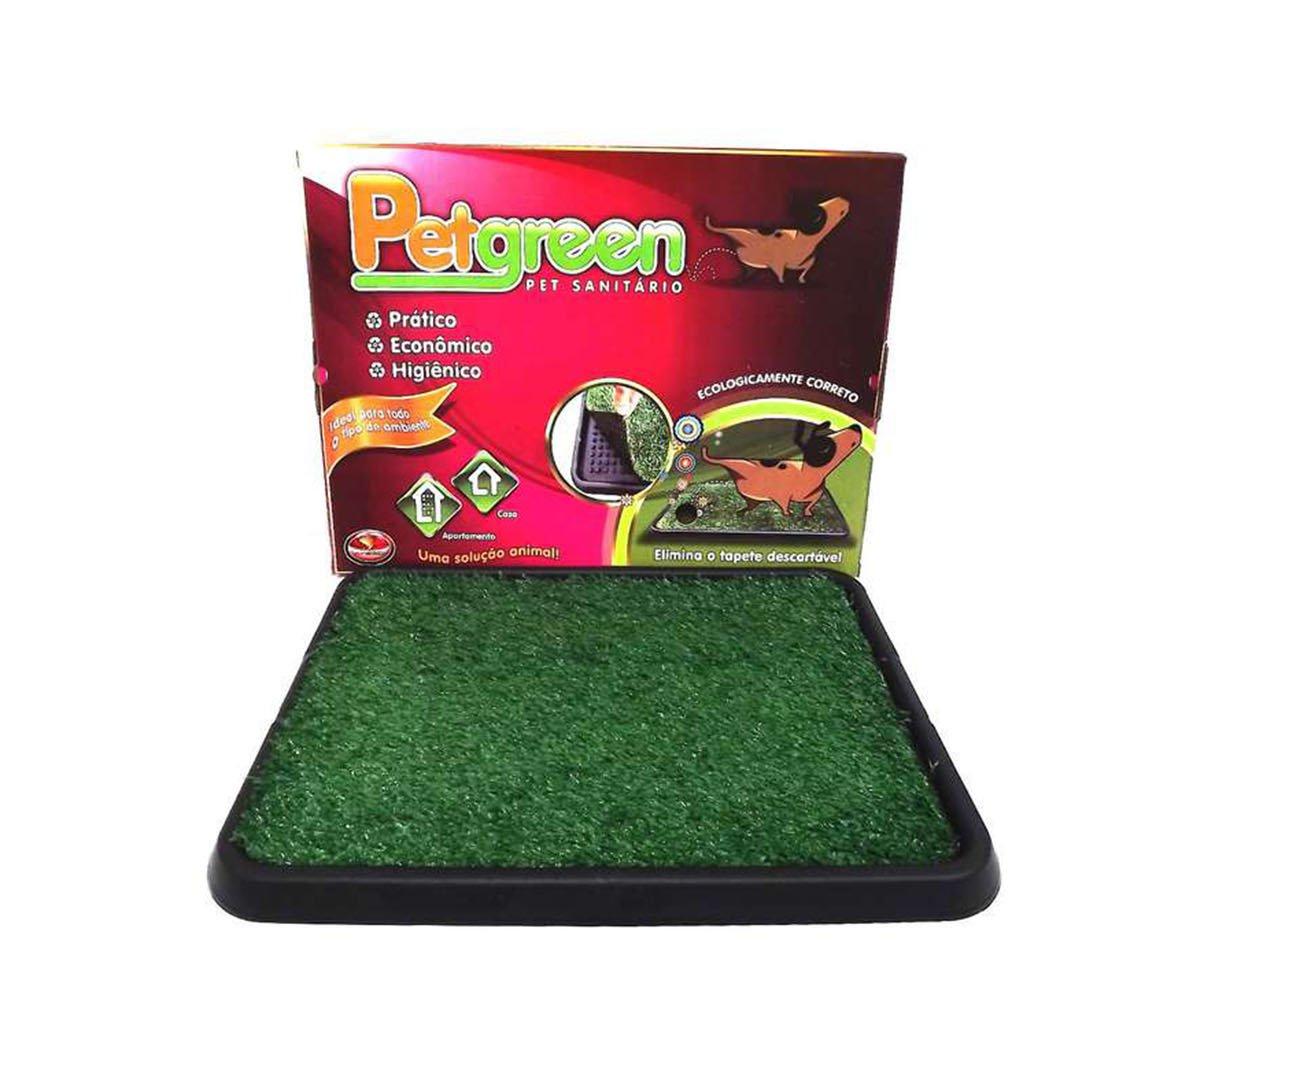 Pet Green Xixi - Furacão Pet